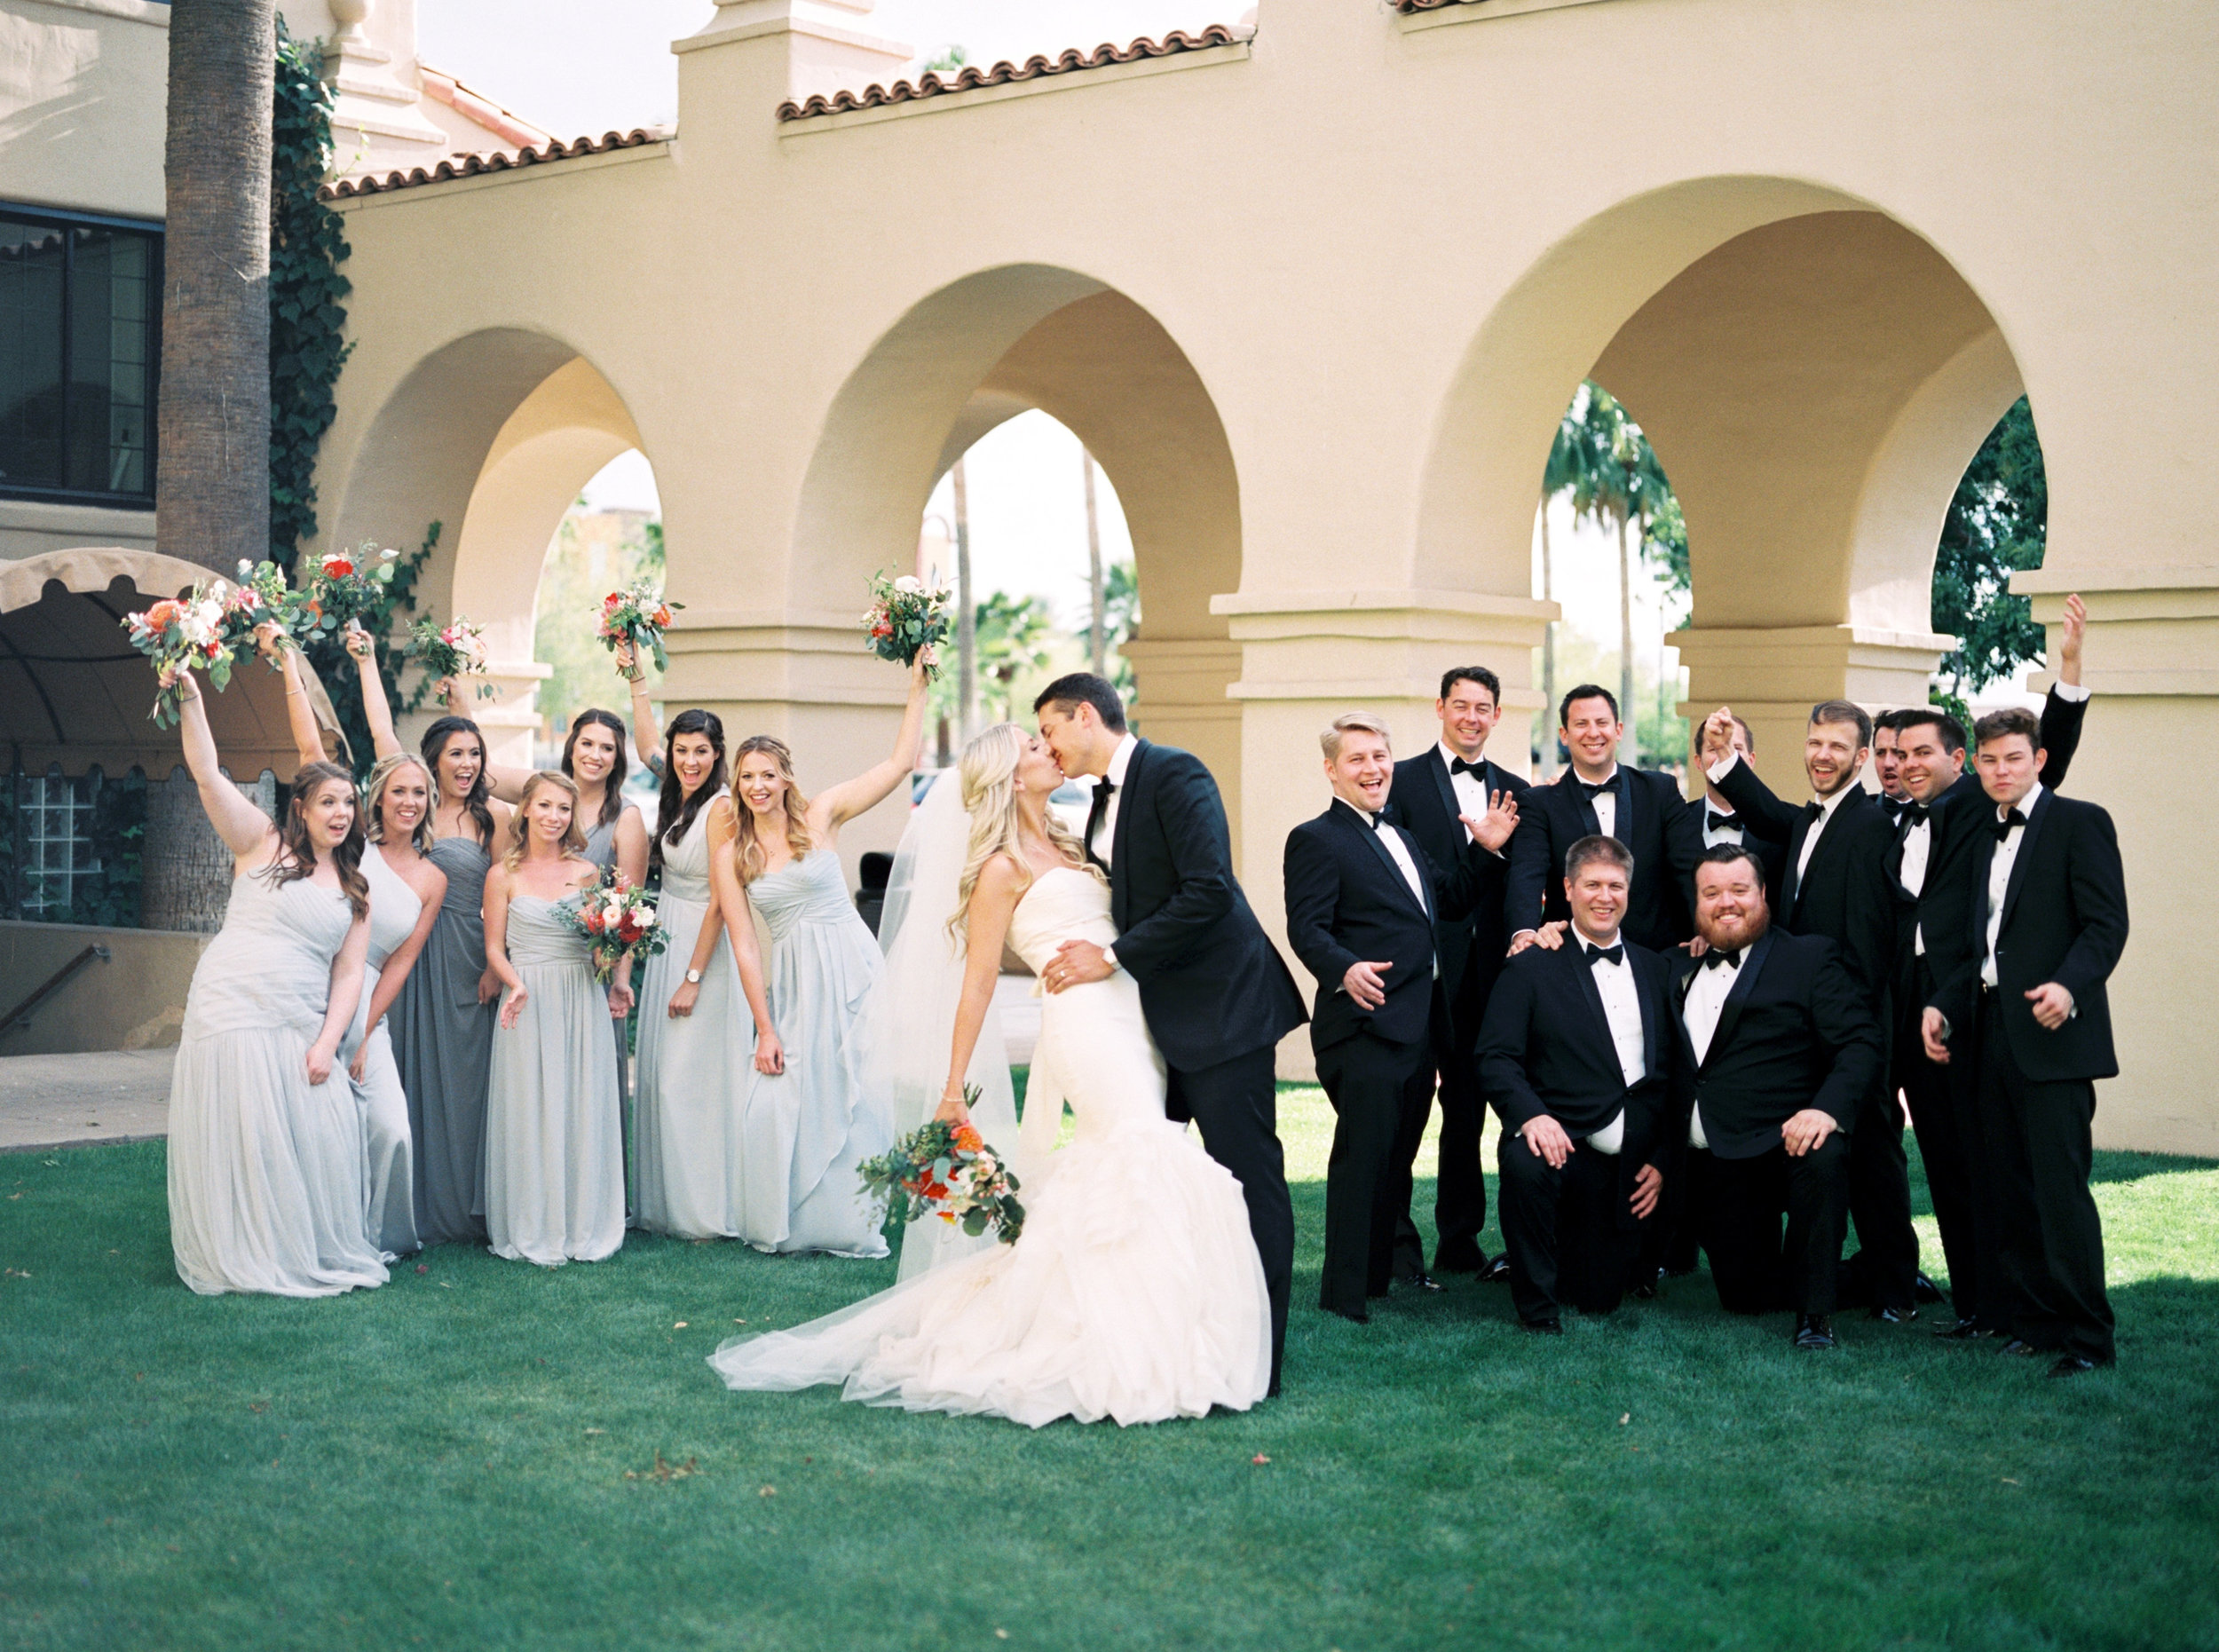 bridal party, bride and groom, bridal bouquet, garden bridal bouquet, gray bridesmaid dresses, bridesmaid bouquets, coral wedding flowers, blush wedding flowers, ivory wedding flowers, orange wedding flowers, groom formal attire, groom tux, groomsmen formal attire.